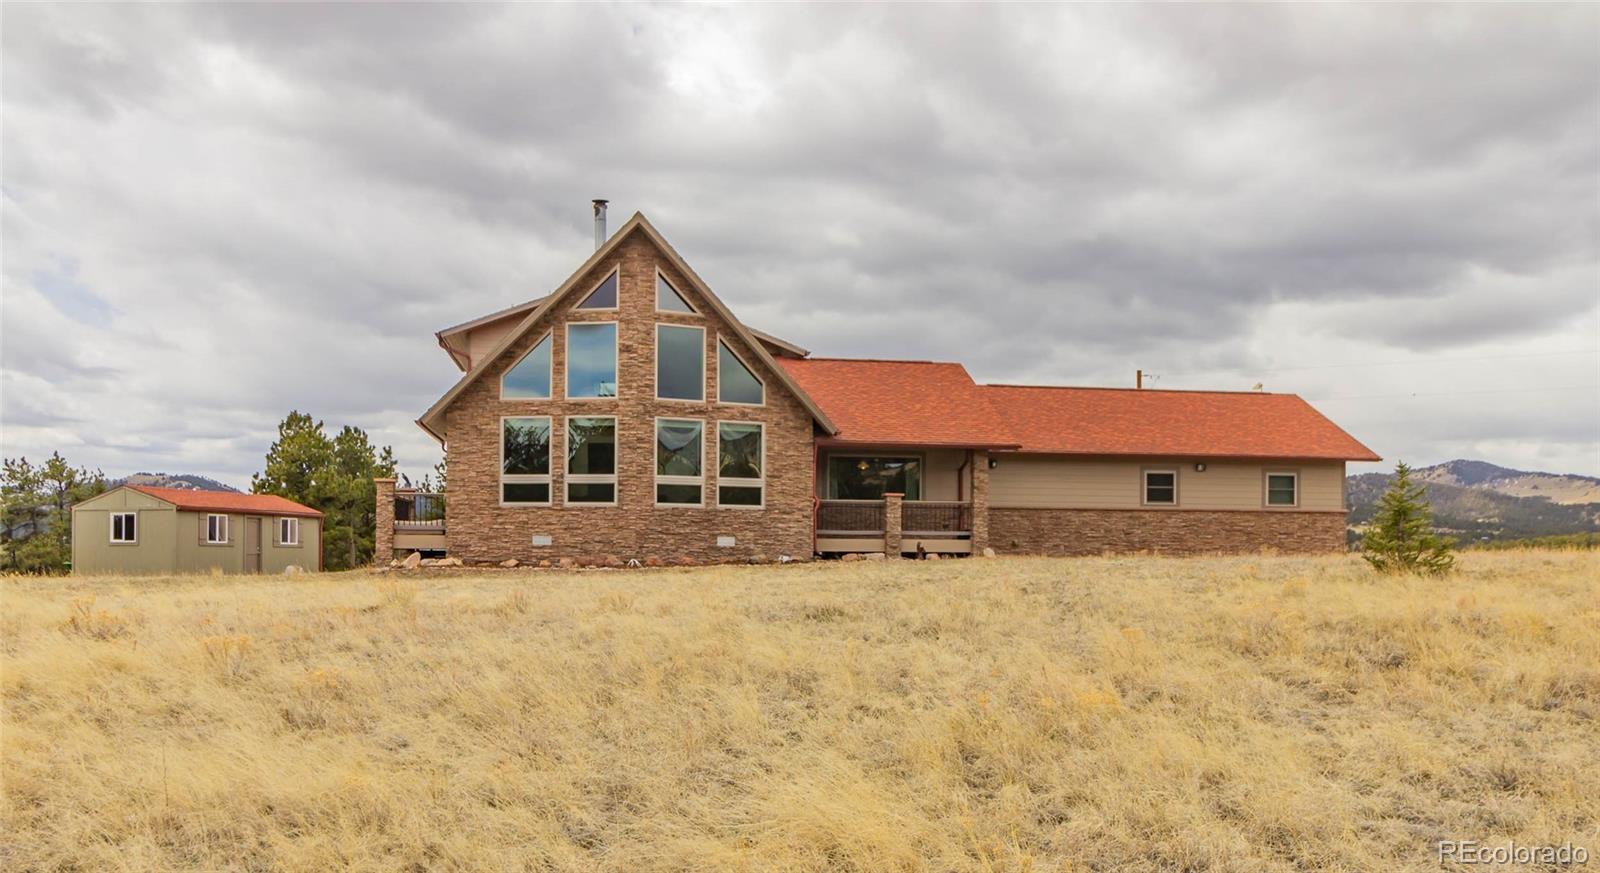 641 Old Kathleen Trail, Guffey, CO 80820 - Guffey, CO real estate listing